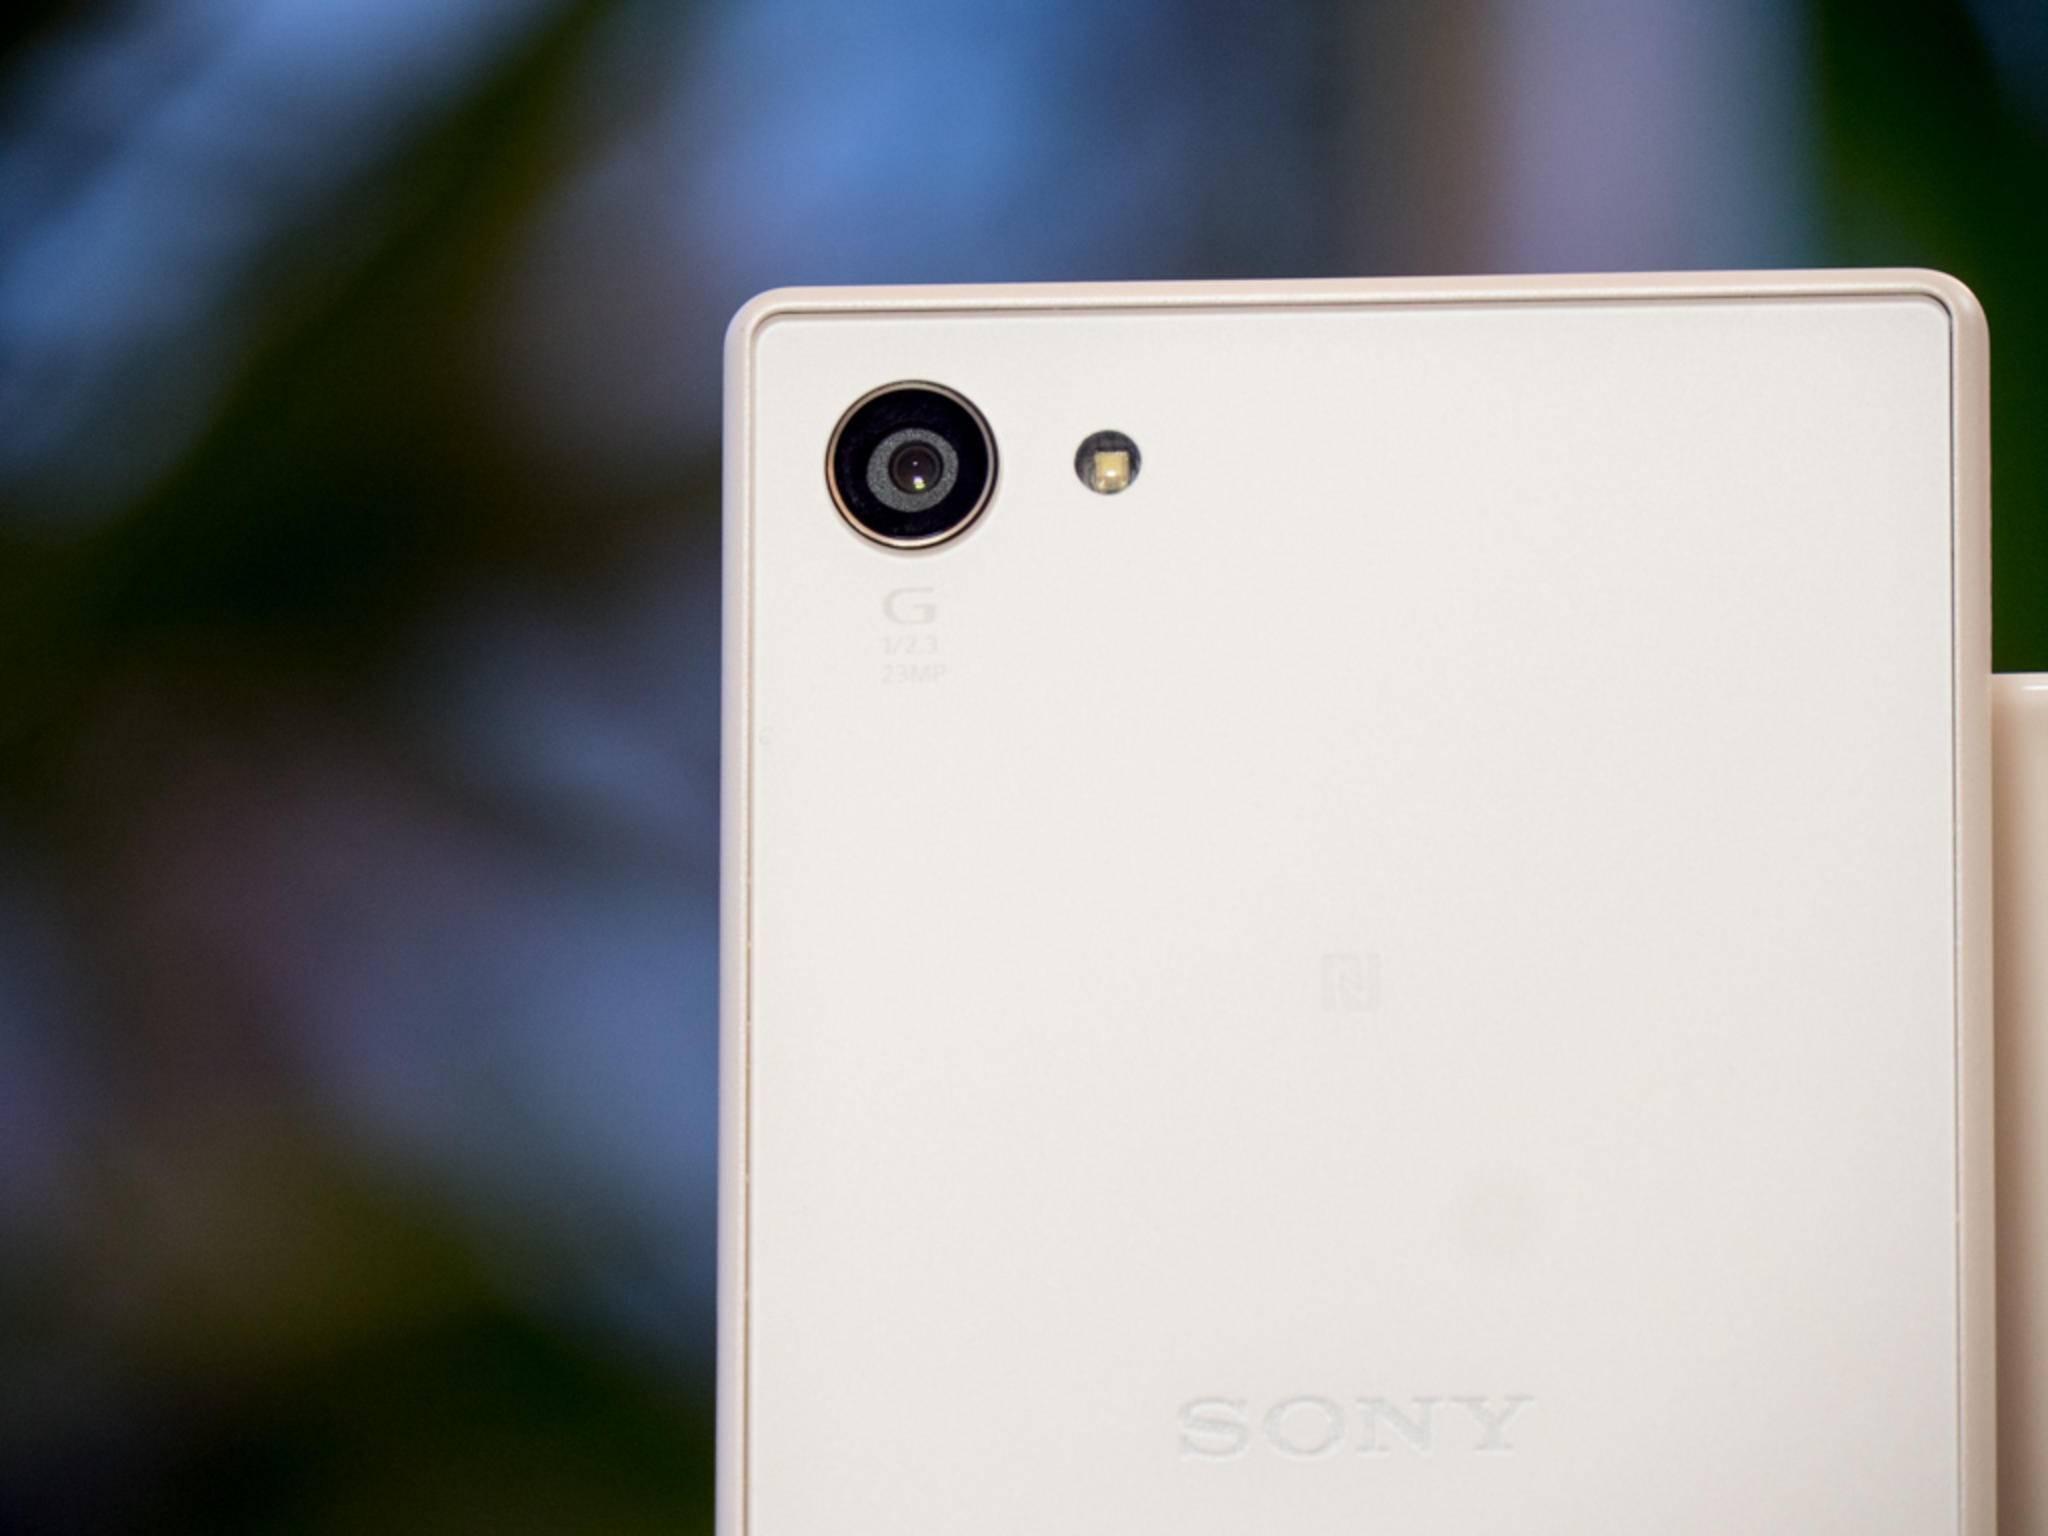 Sony Xperia Z5 Compact 5